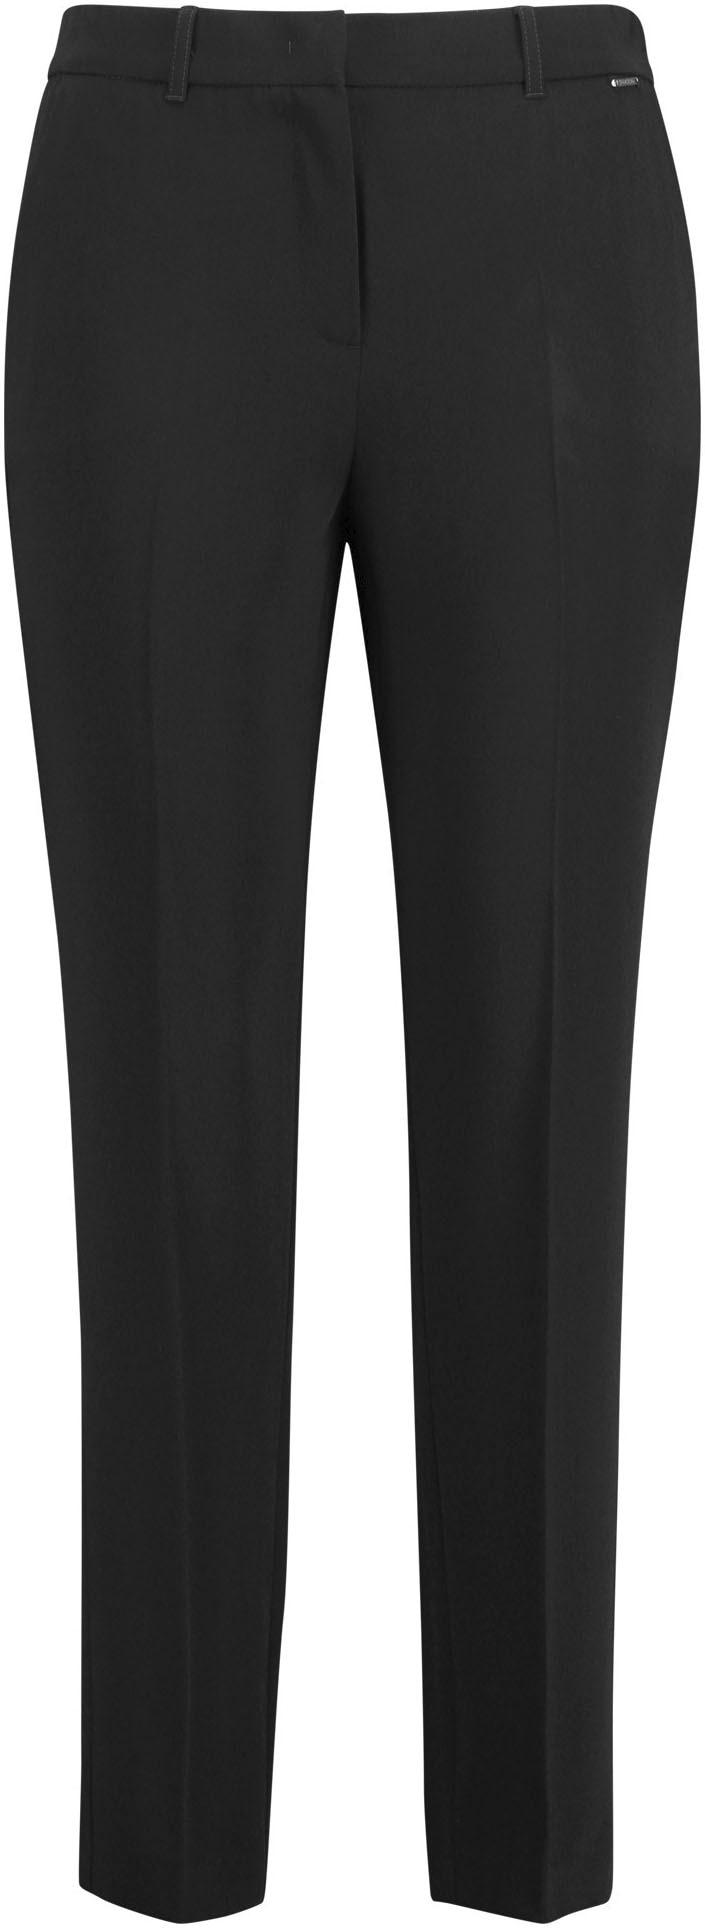 samoon -  Stoffhose, mit Gürtelschlaufen